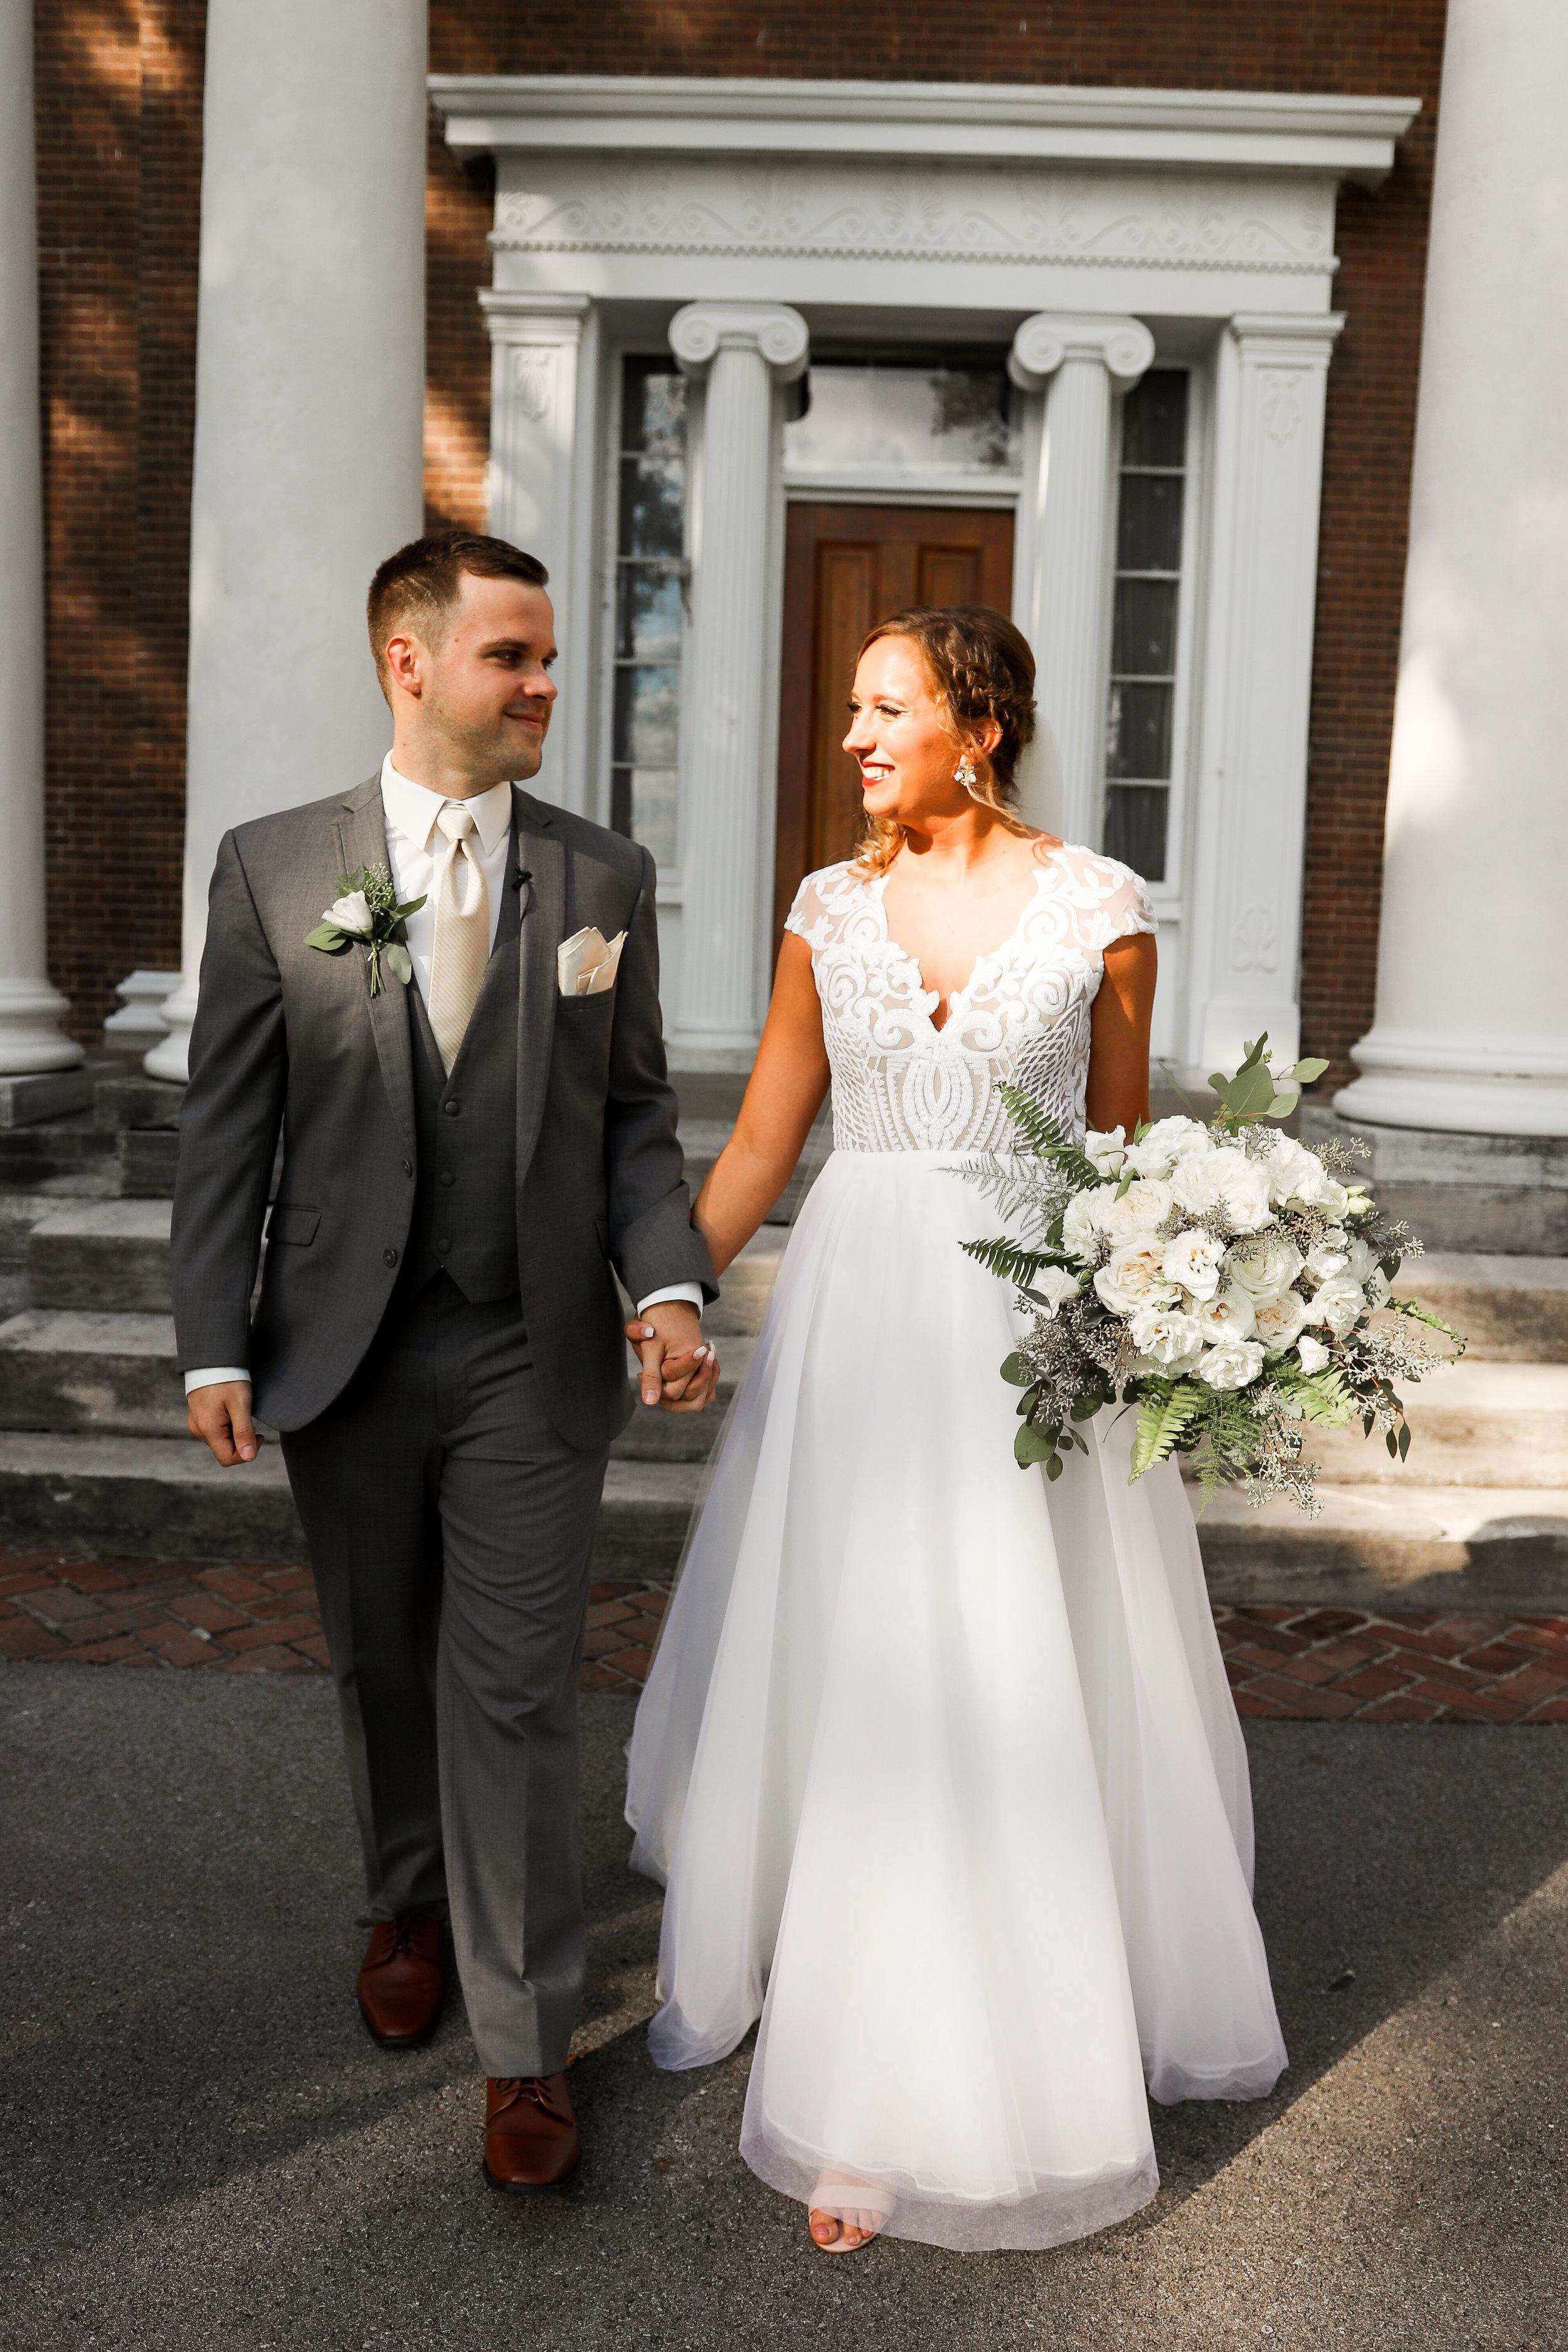 Grand-Reserve-Lexington-Kentucky-Wedding-16.jpg